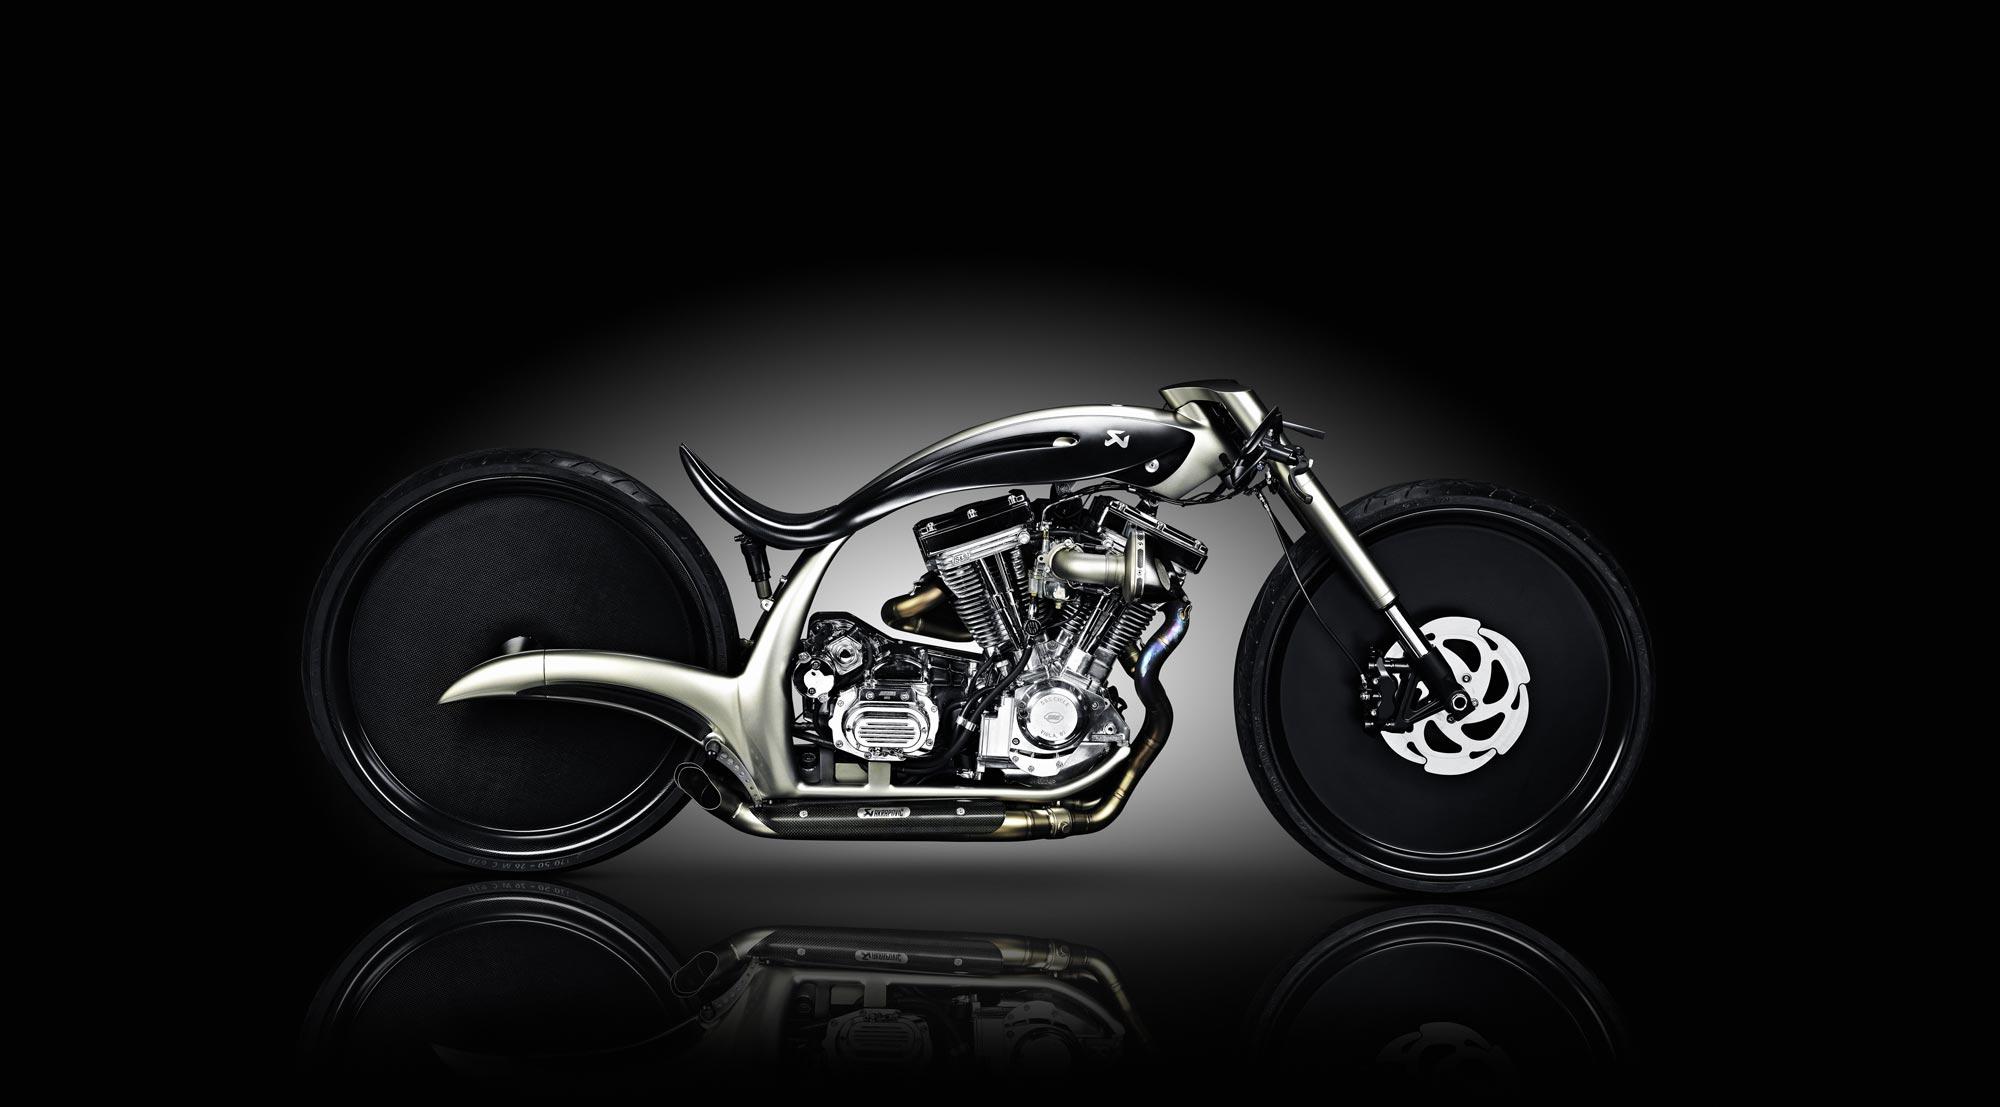 Akrapovič Morsus Custom Motorcycle Asphalt Amp Rubber